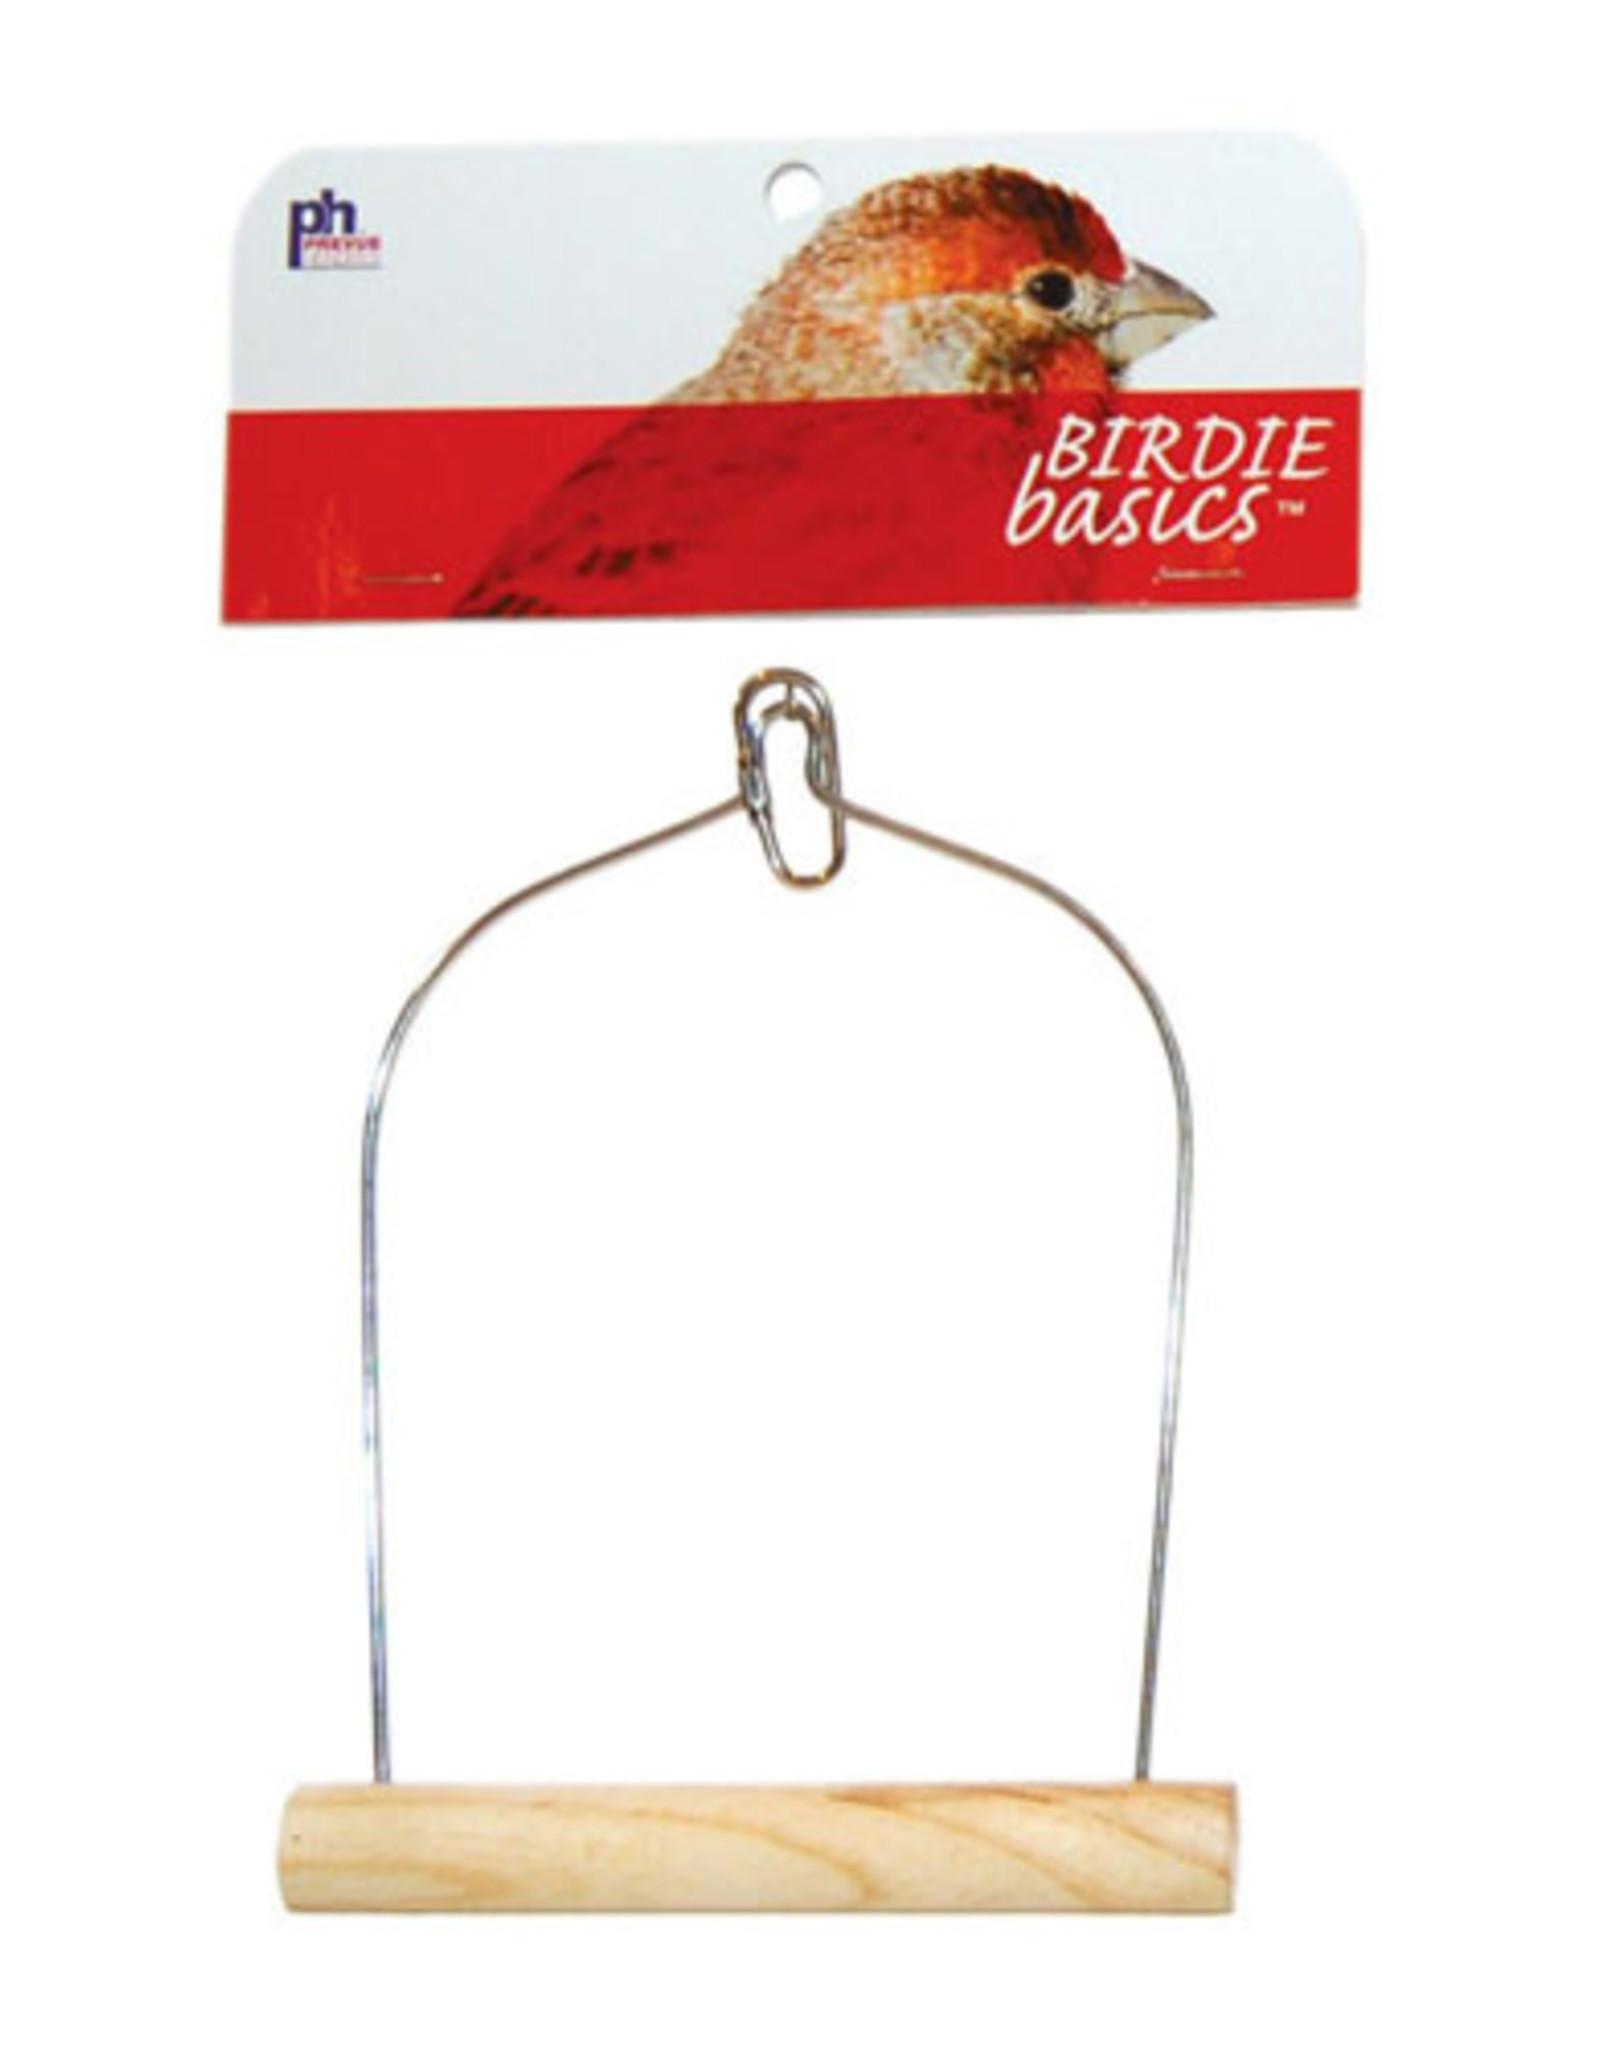 Birdie Basics BIRDIE BASICS 5x7in SWING